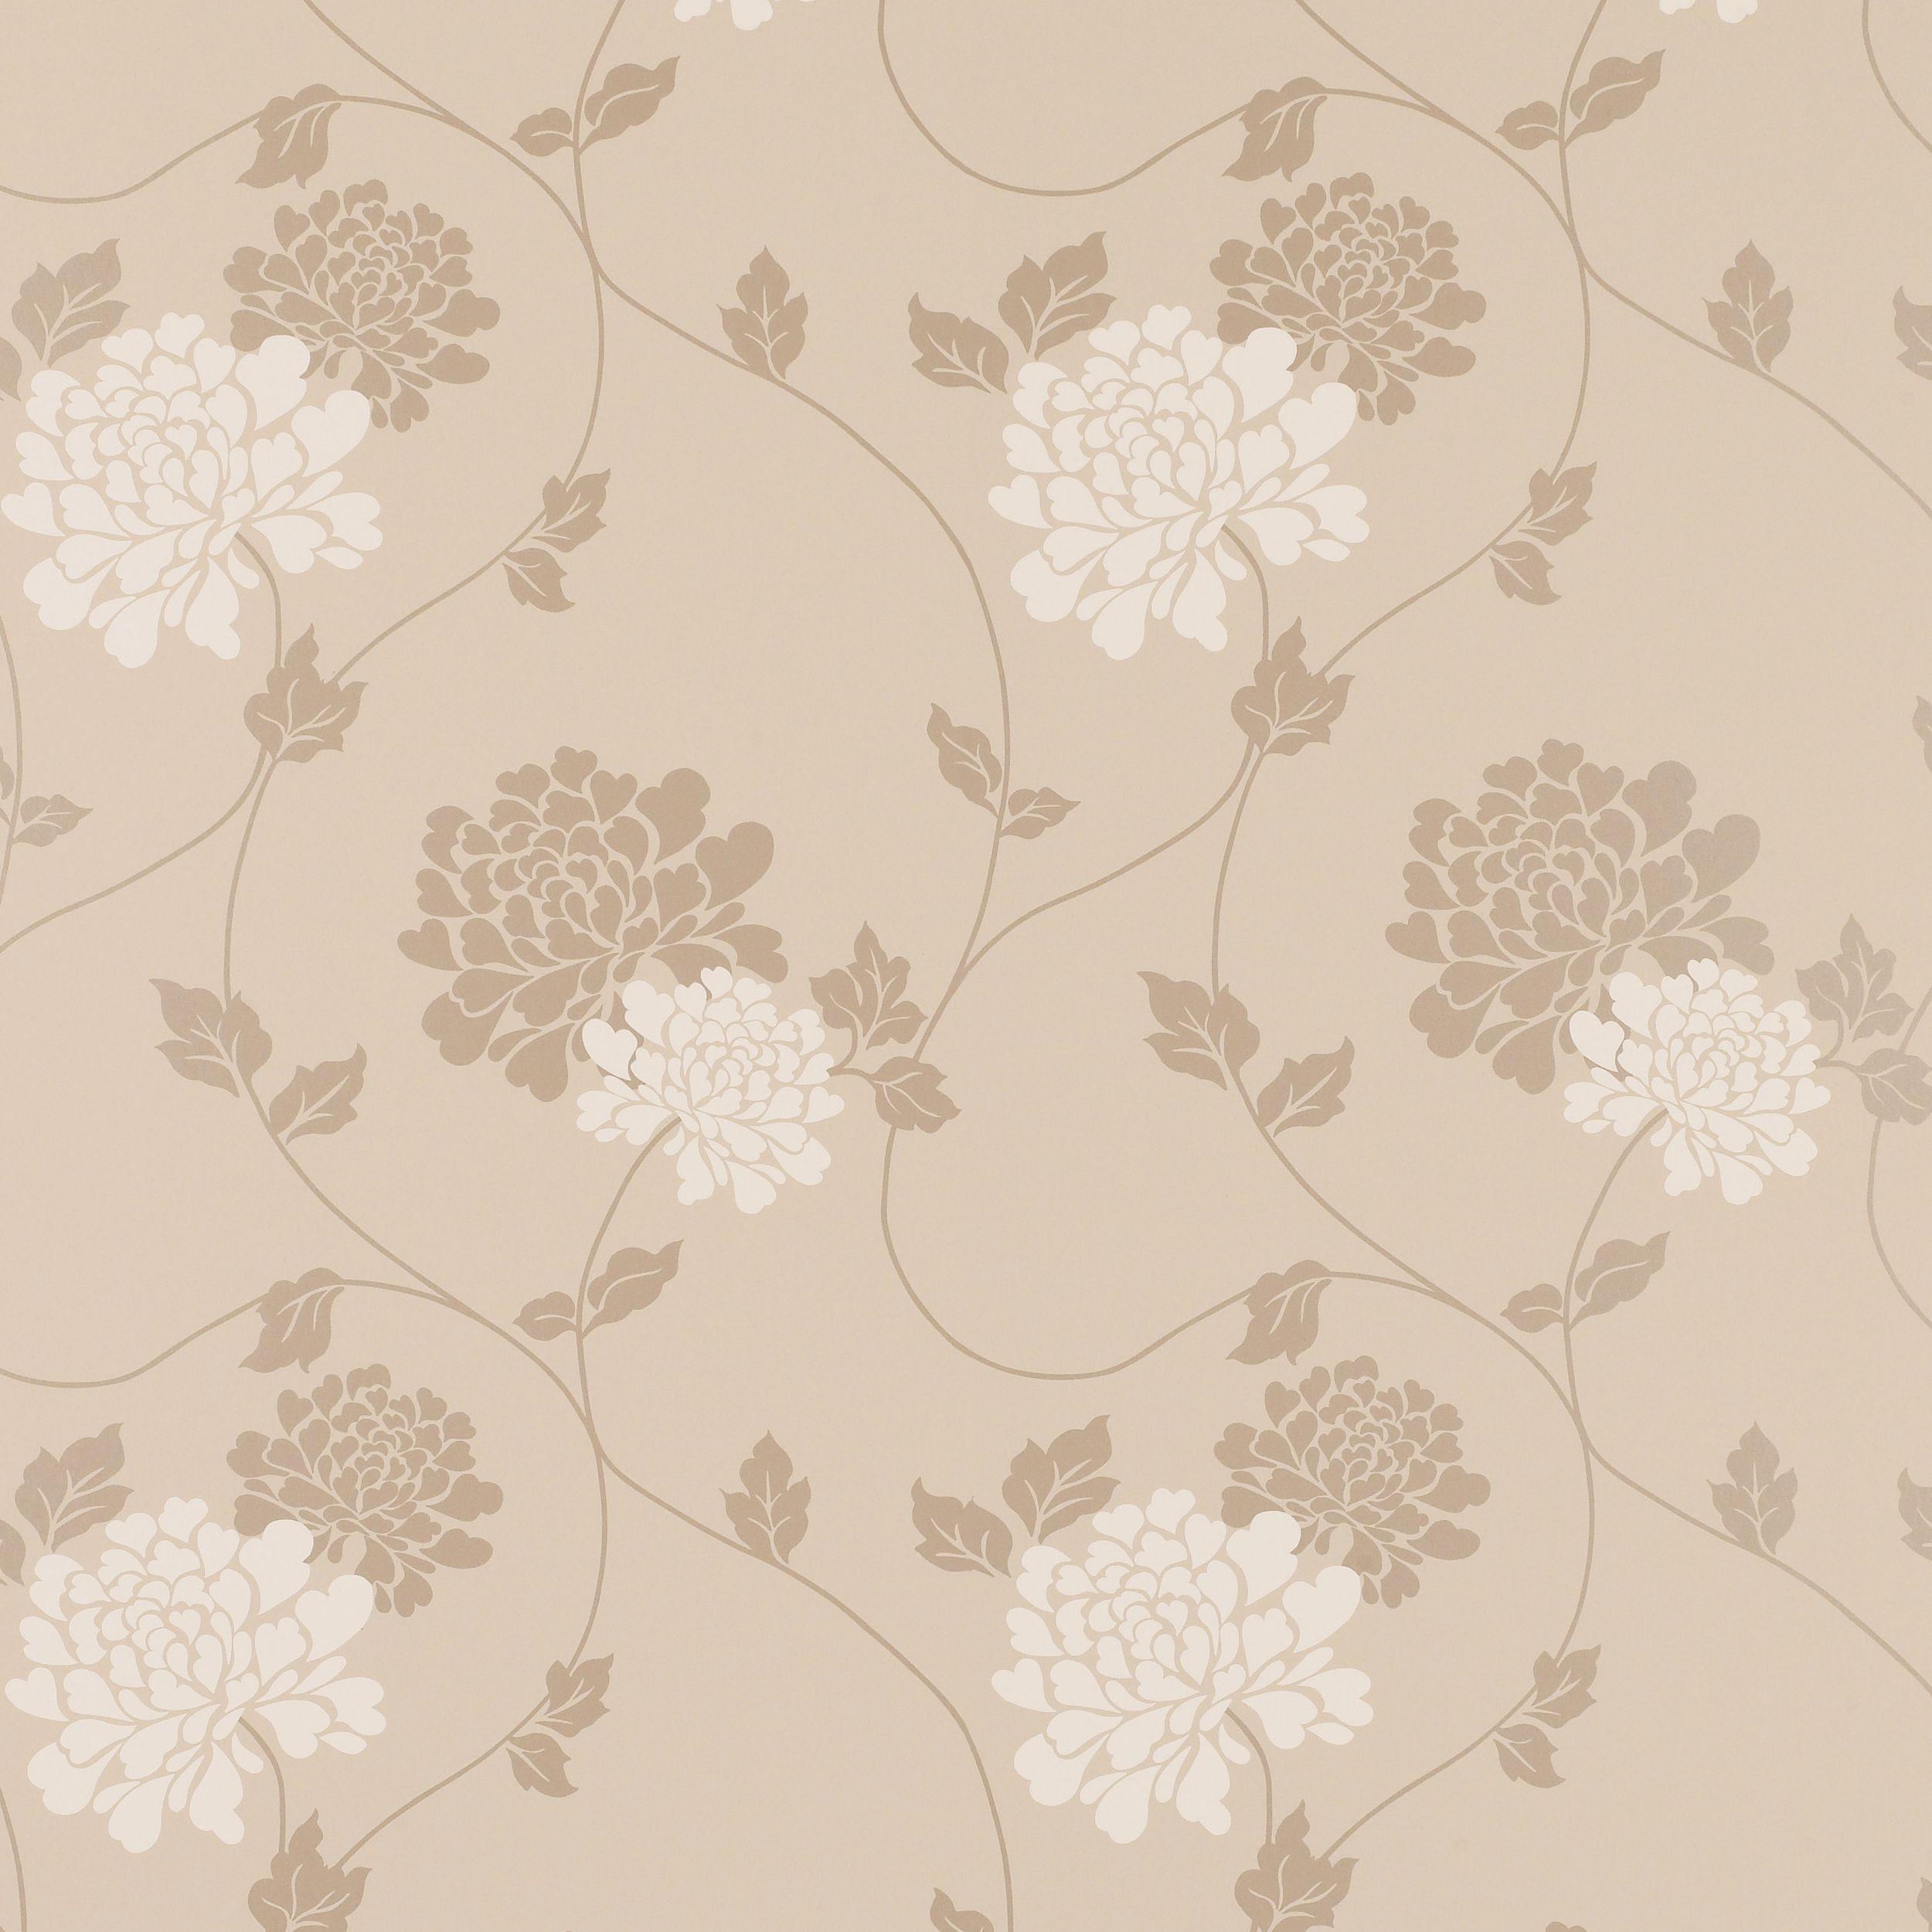 laura ashley isodore truffle floral wallpaper Buscar con Google